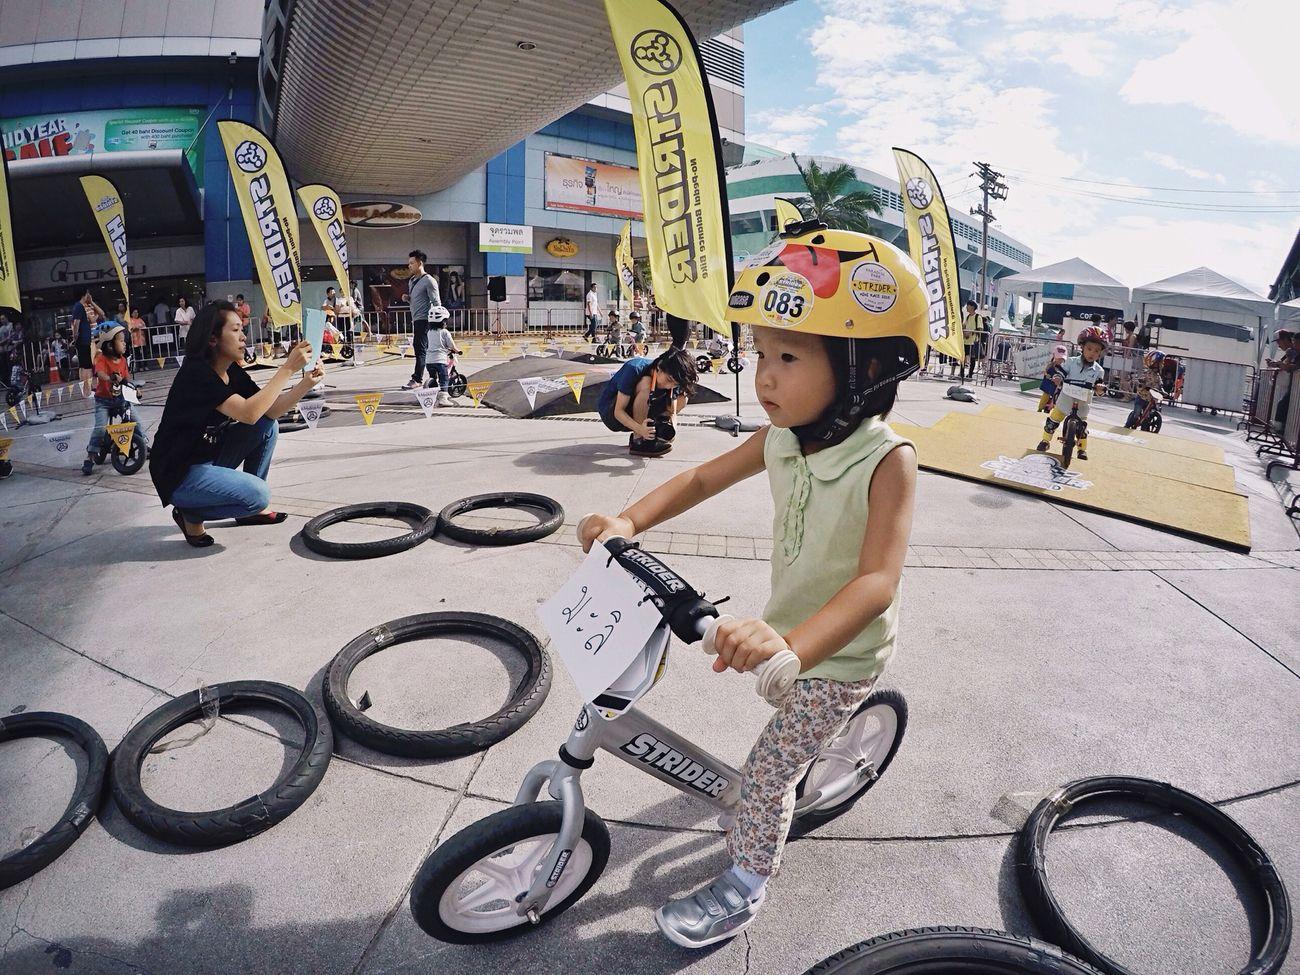 Marisa   June 21, 2015. Malidiary StrideOn Humanride Daily Life Gopro GoPrography Open Edit EyeEm Bangkok